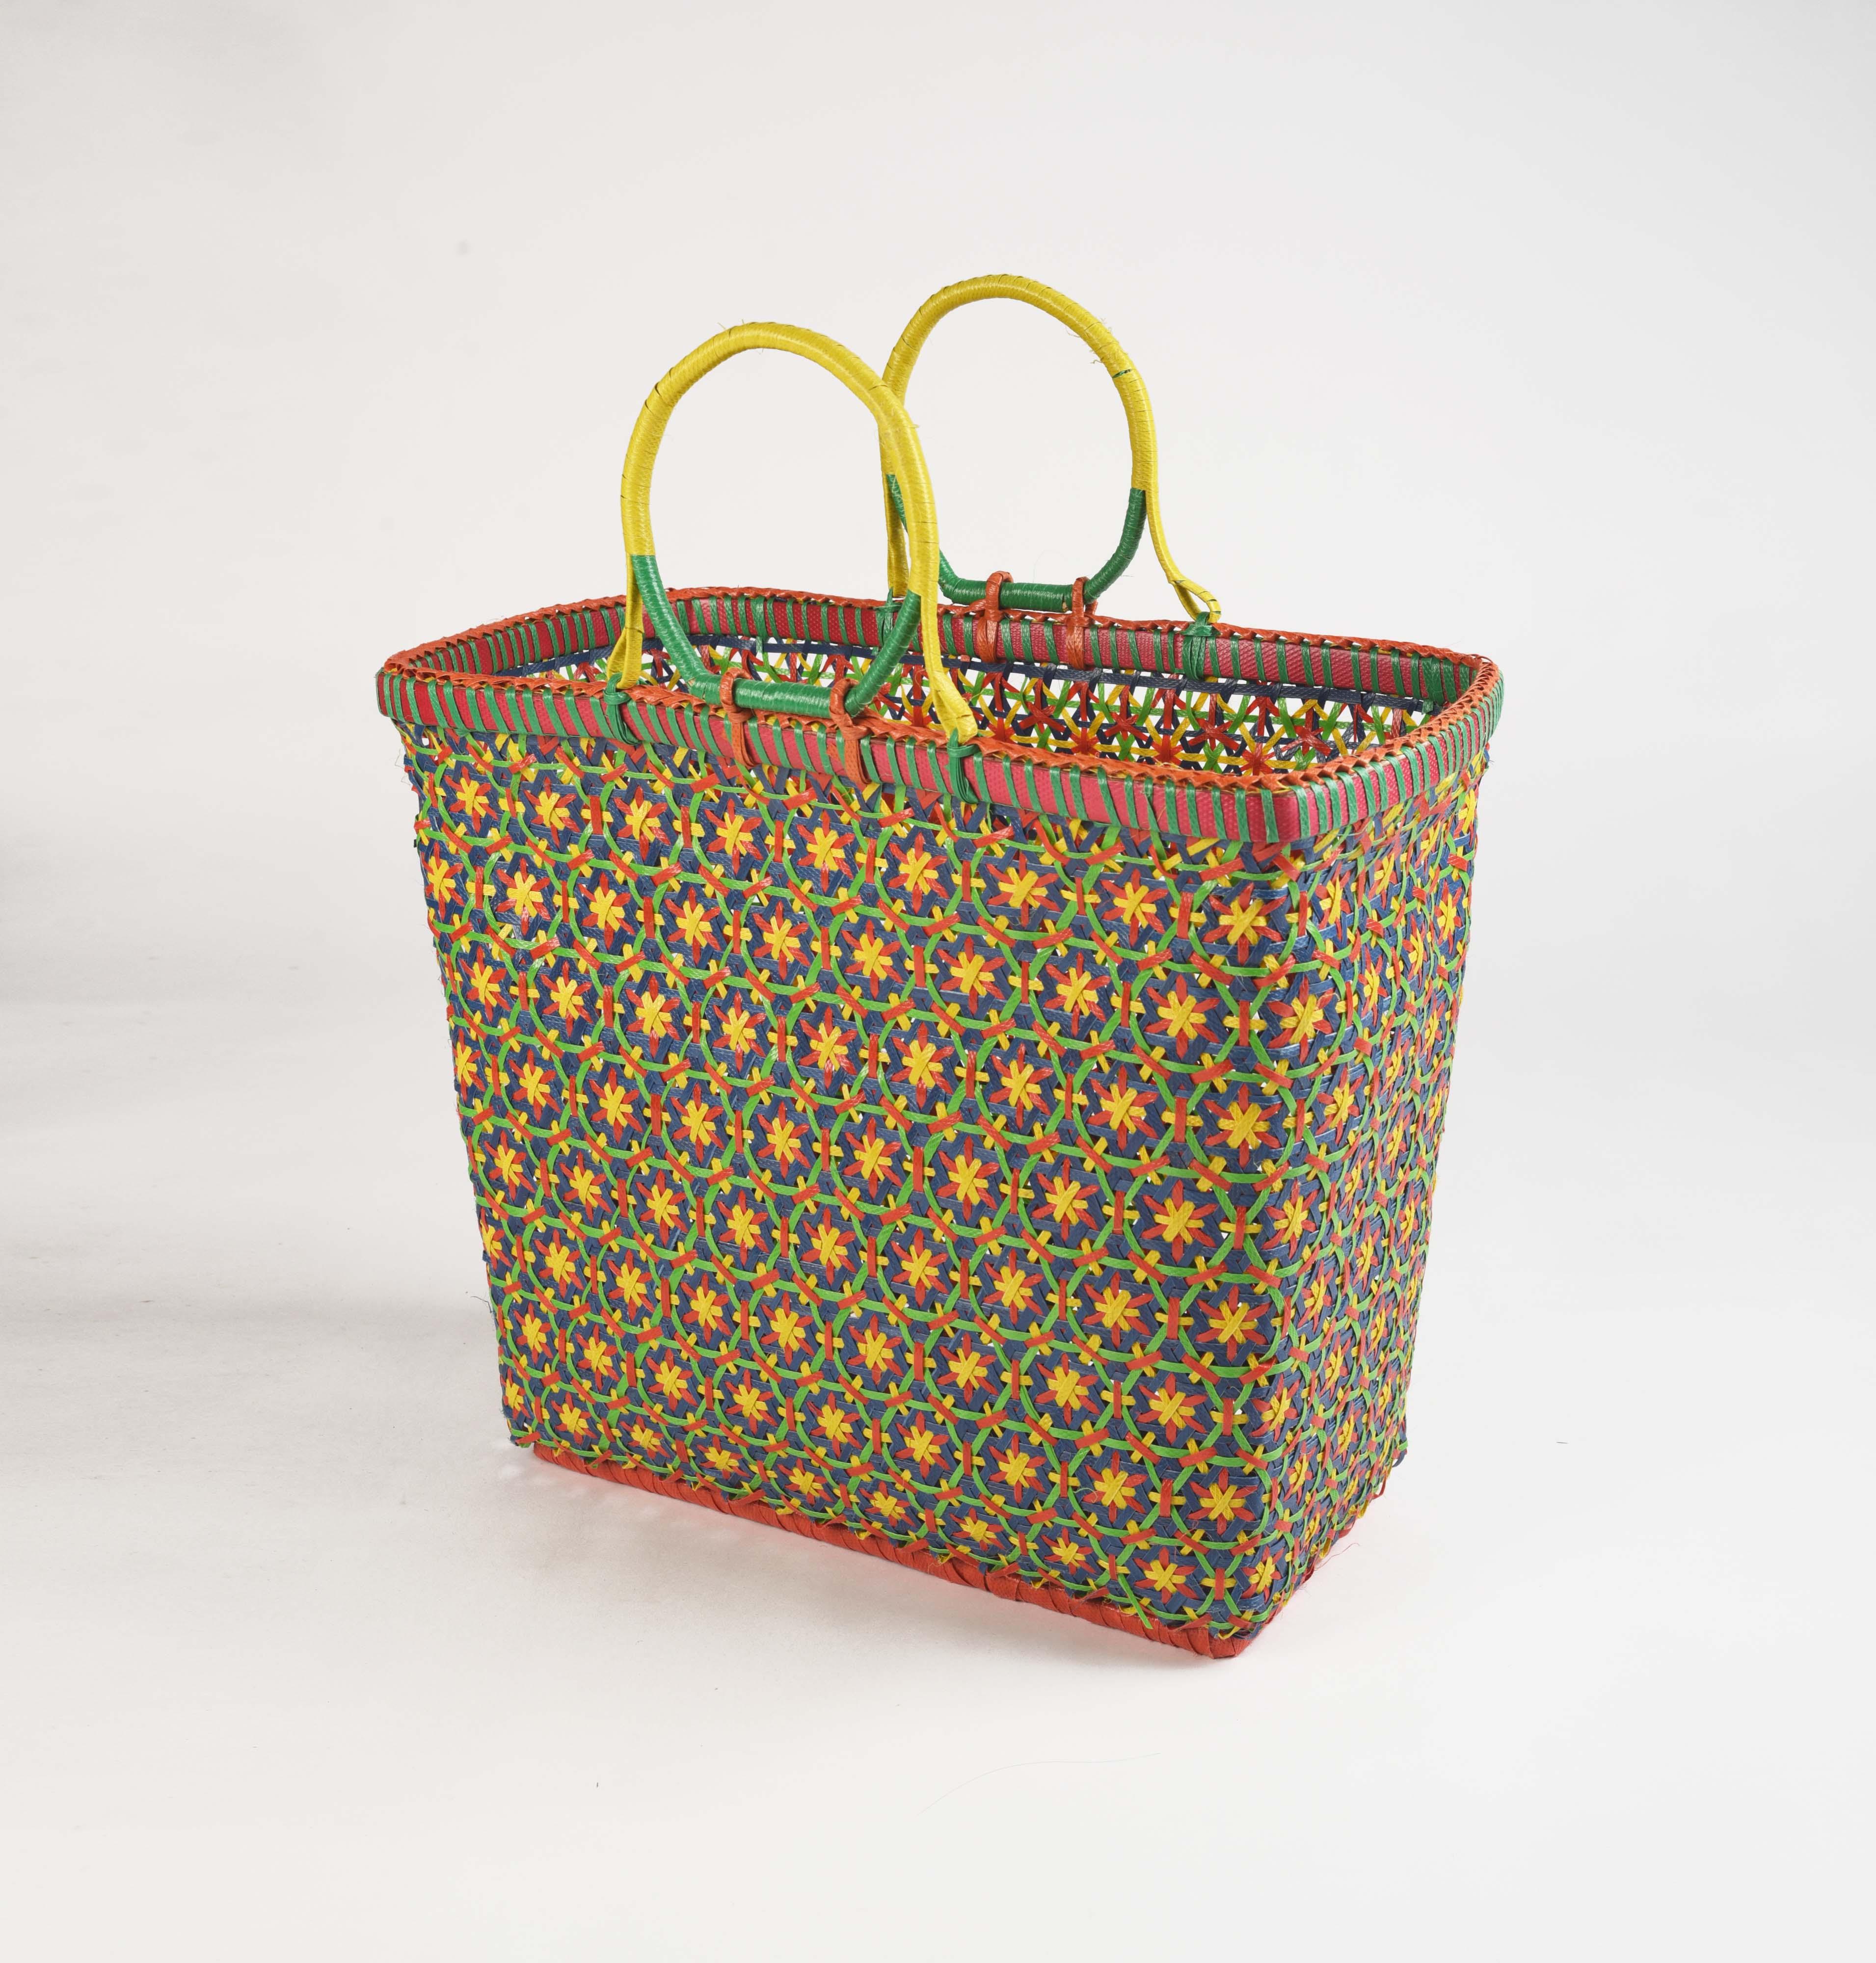 Recycled plastic basket, handmade basket, blue, yellow colour, beach basket, picnic basket